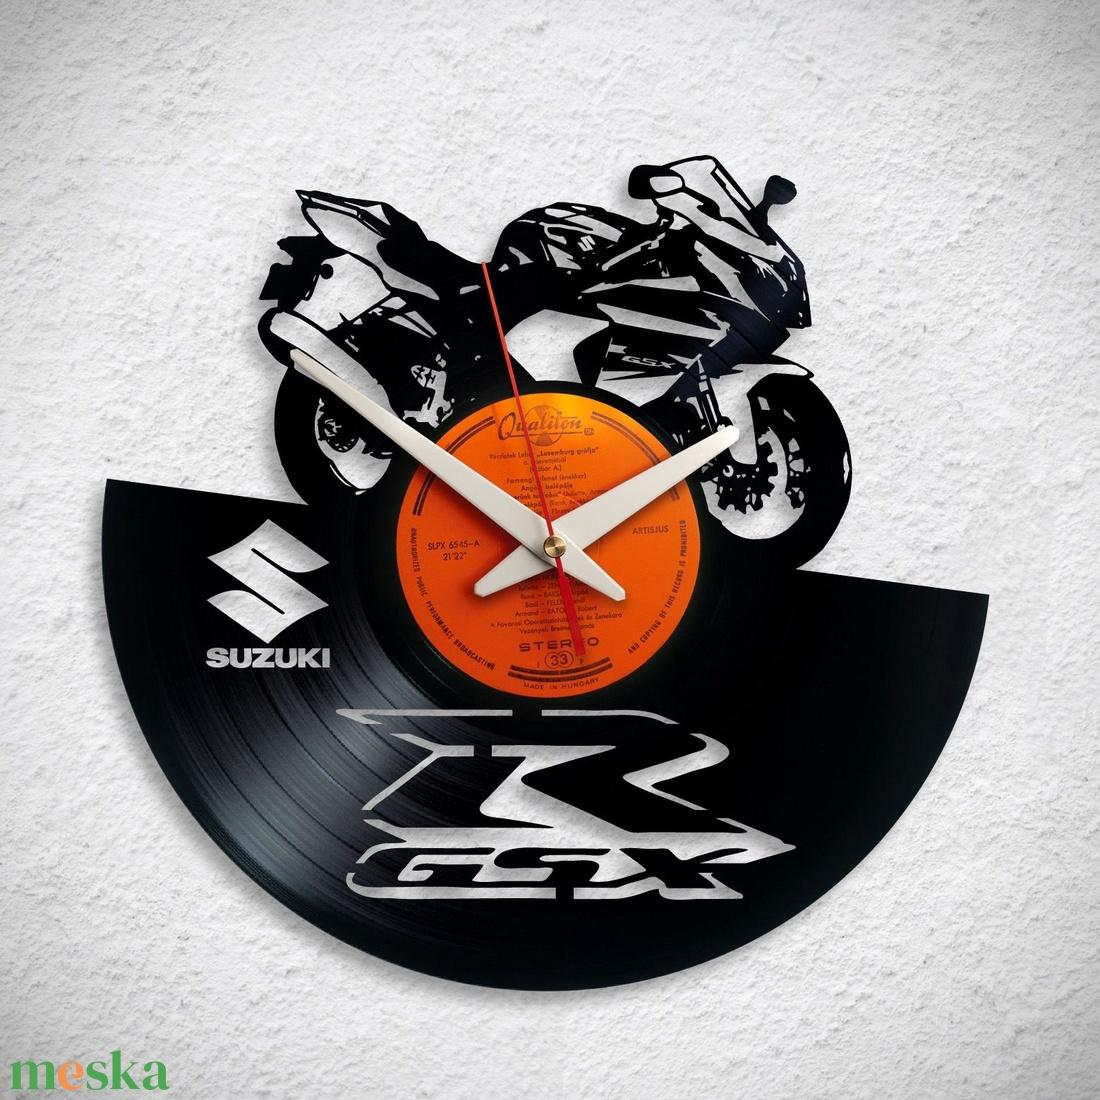 Suzuki R GSX - Bakelit falióra - Meska.hu